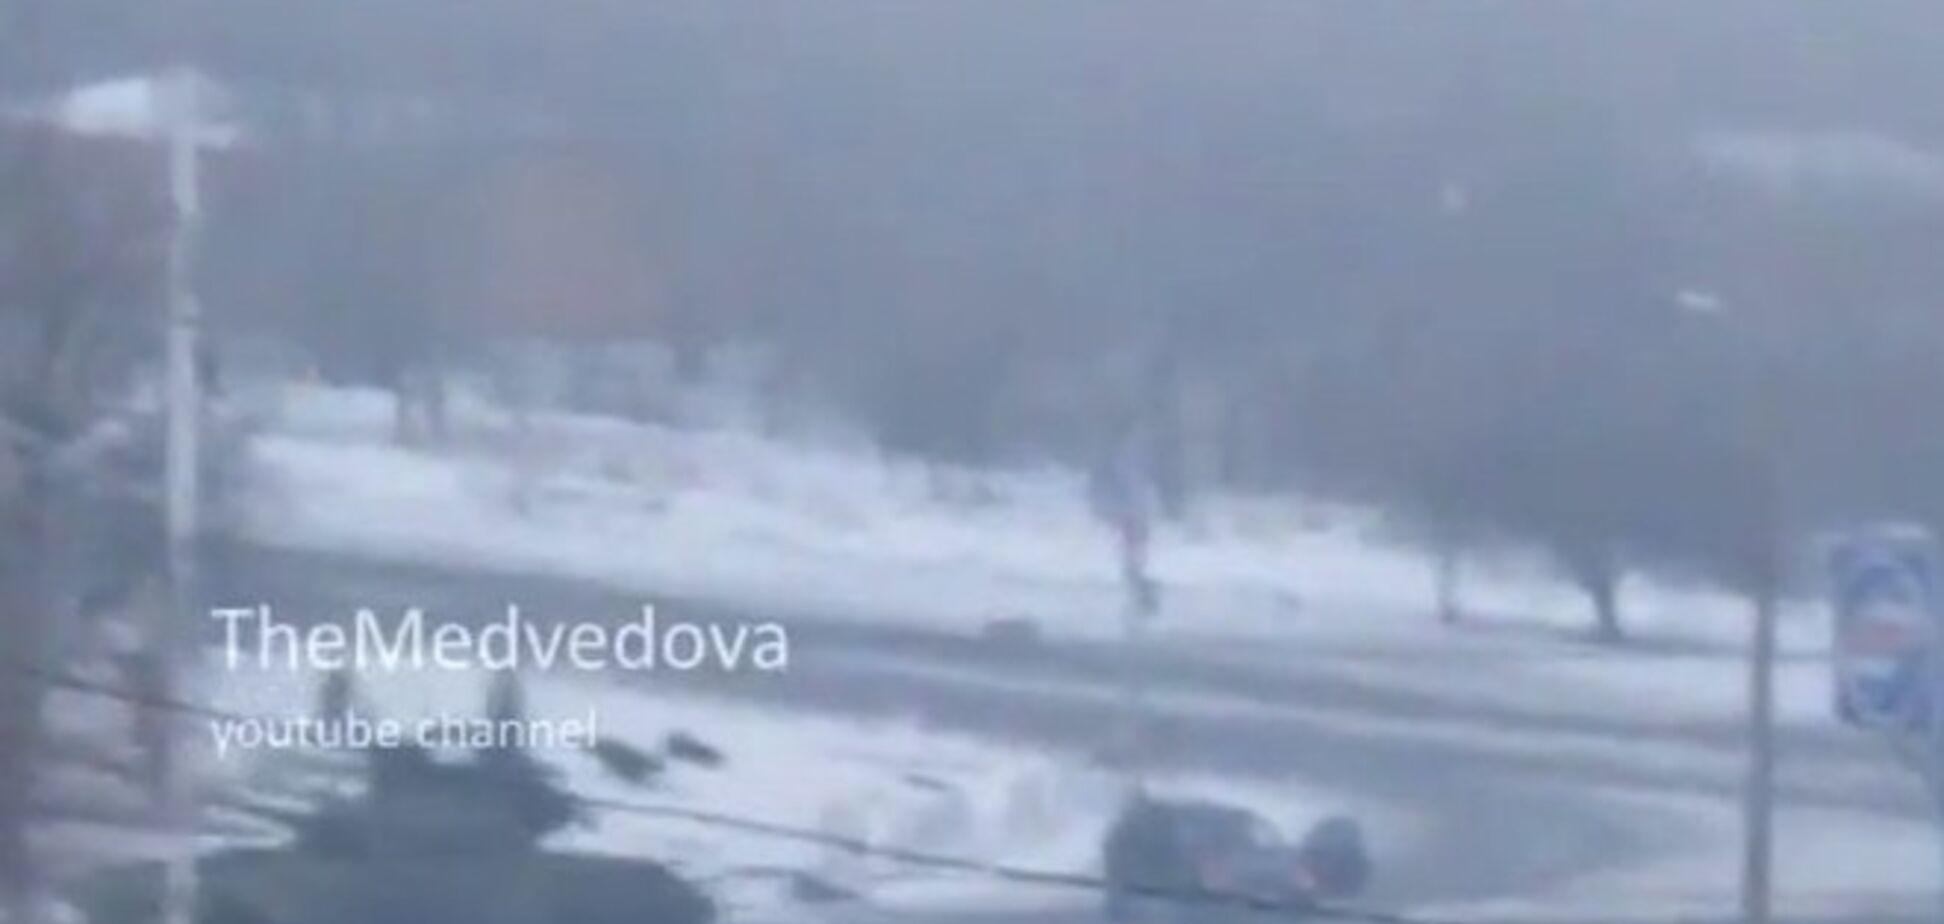 Колонна танков движется на Стаханов: видео от очевидца